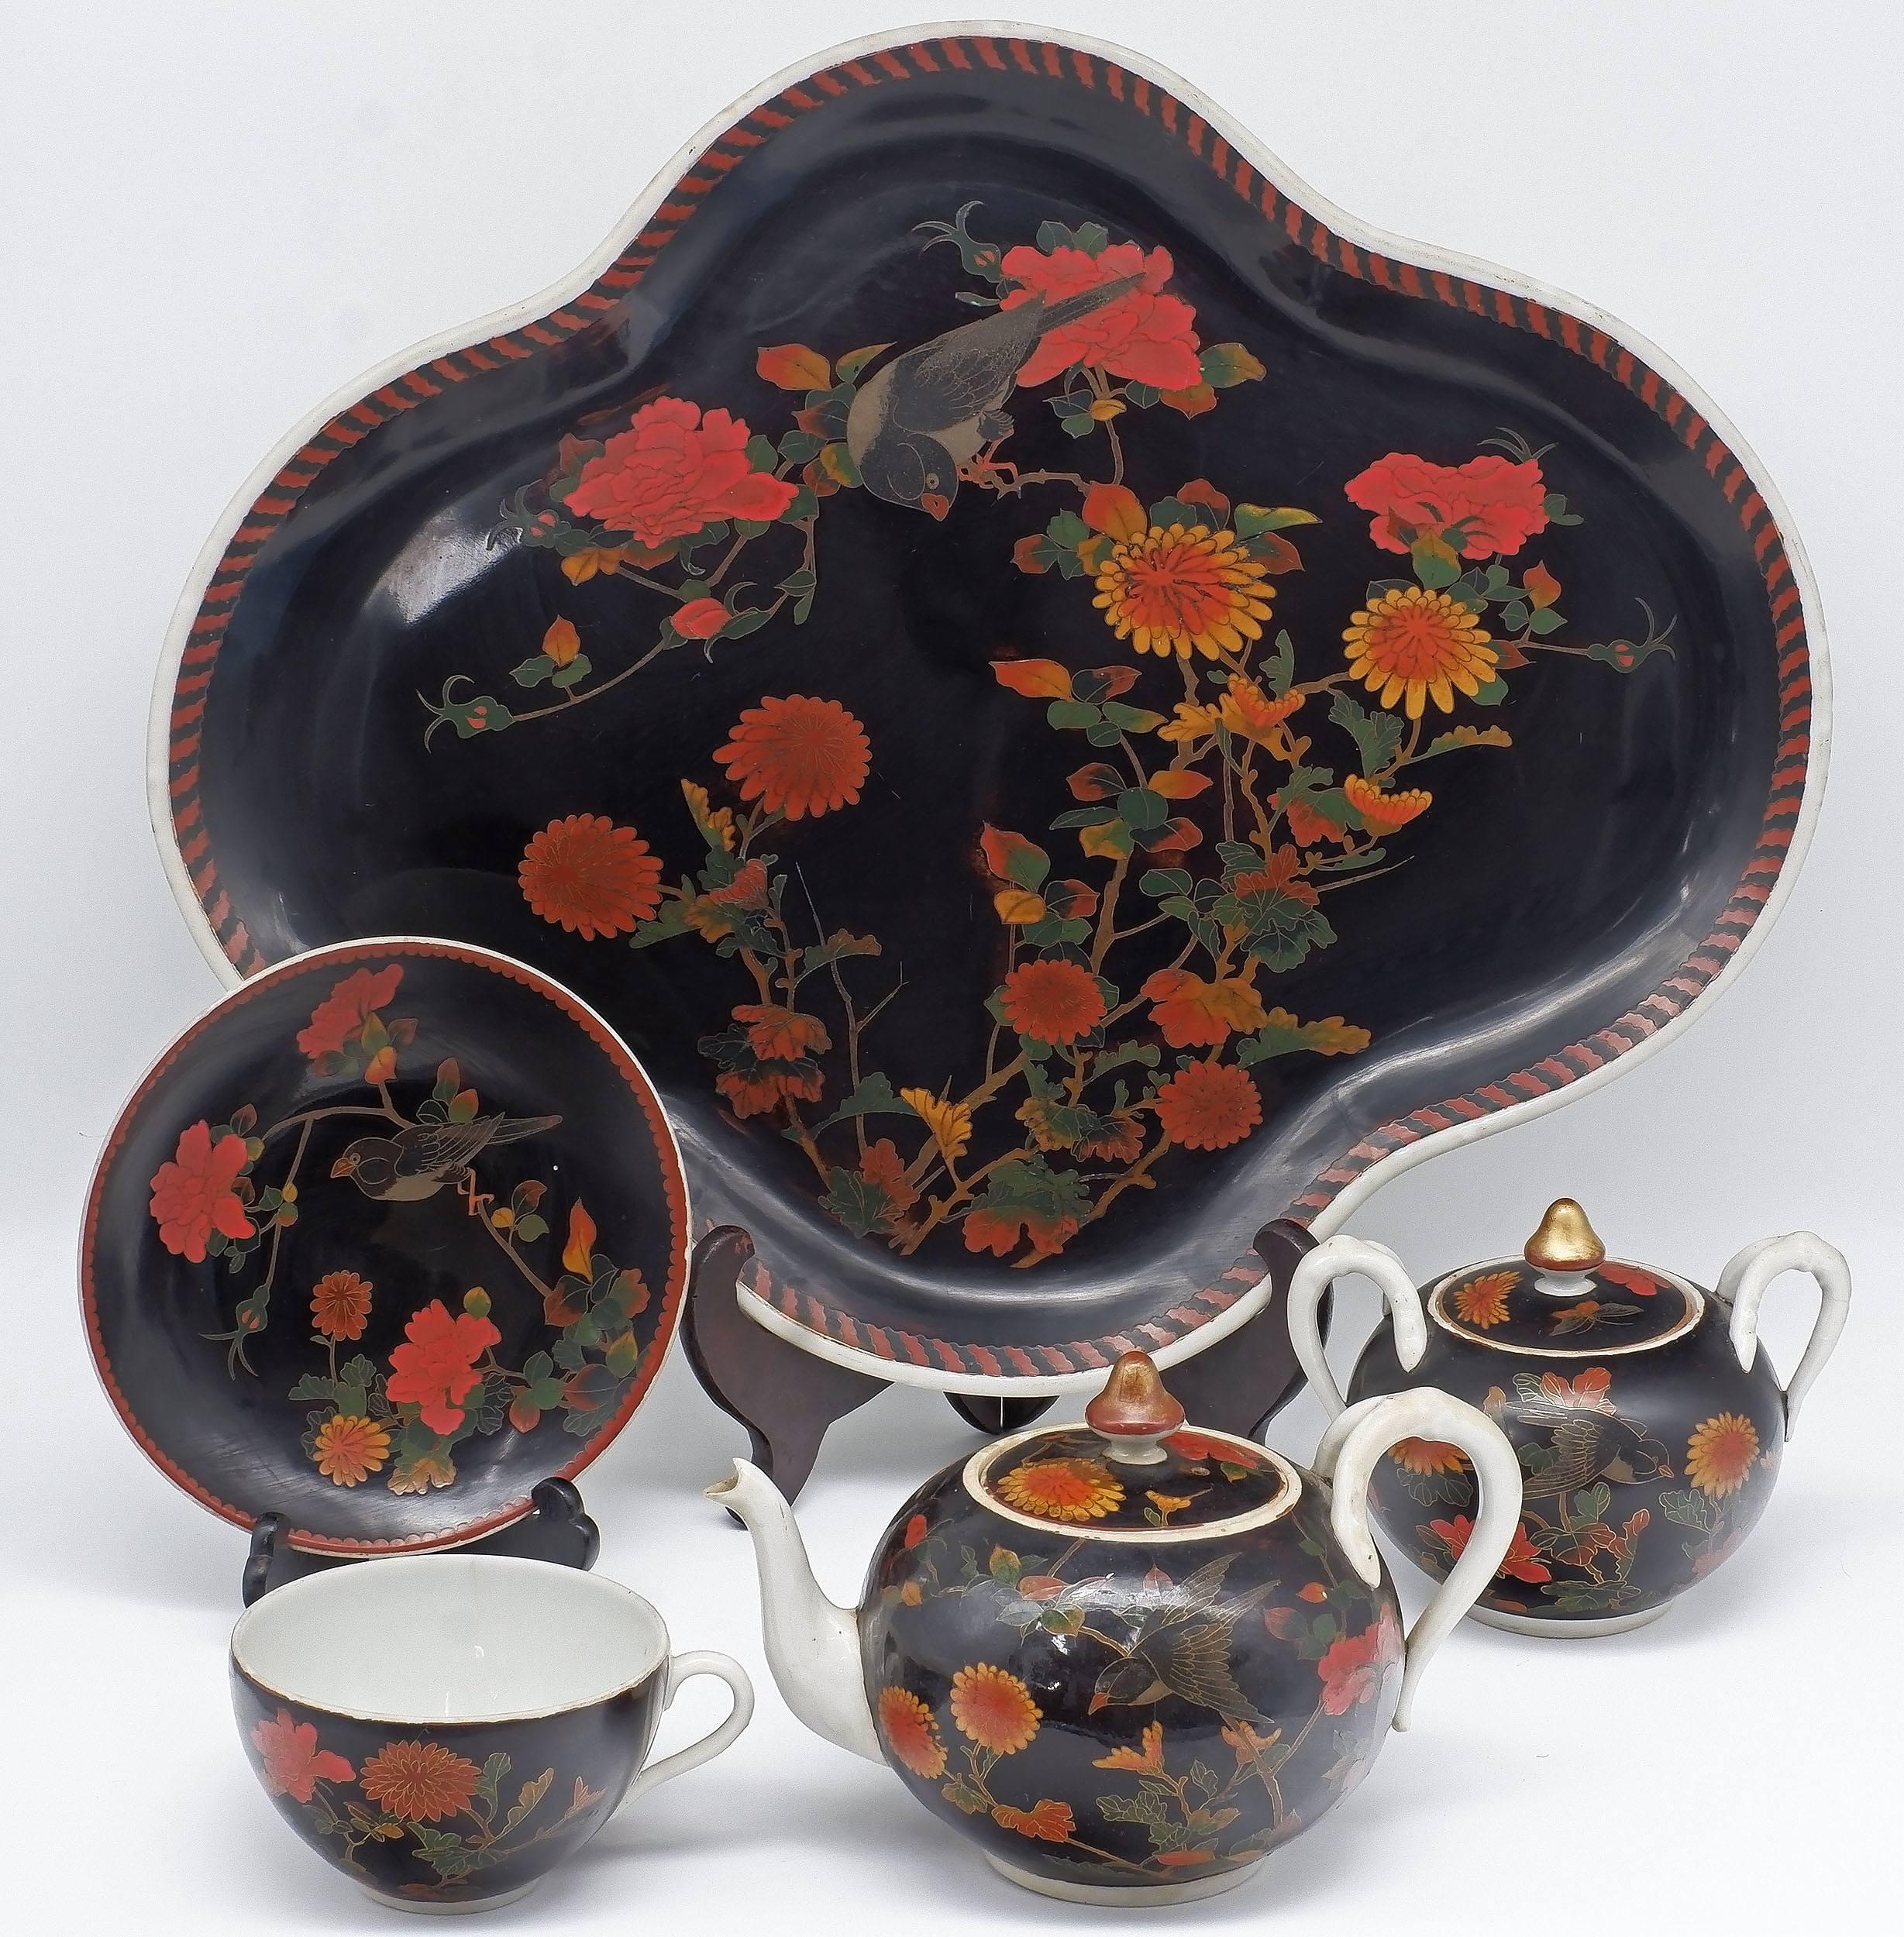 'Rare Japanese Cloisonne Enamel on Porcelain Bachelors Tea Set, Seto Ware, Meiji Period 1868-1912'